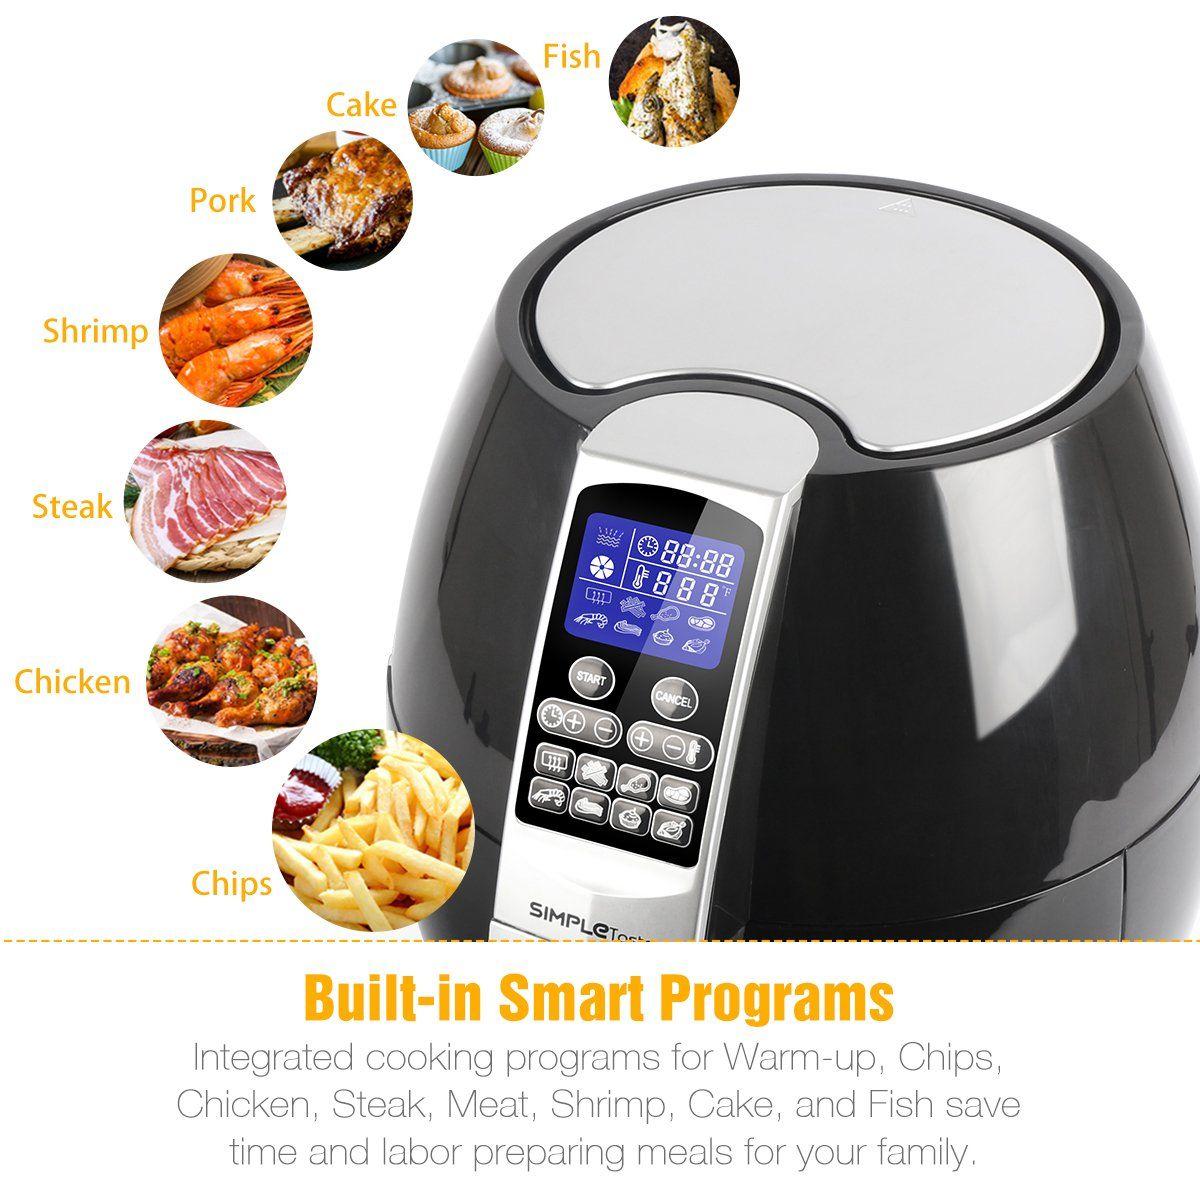 SimpleTaste 1400W Multifunction Electric Air Fryer with